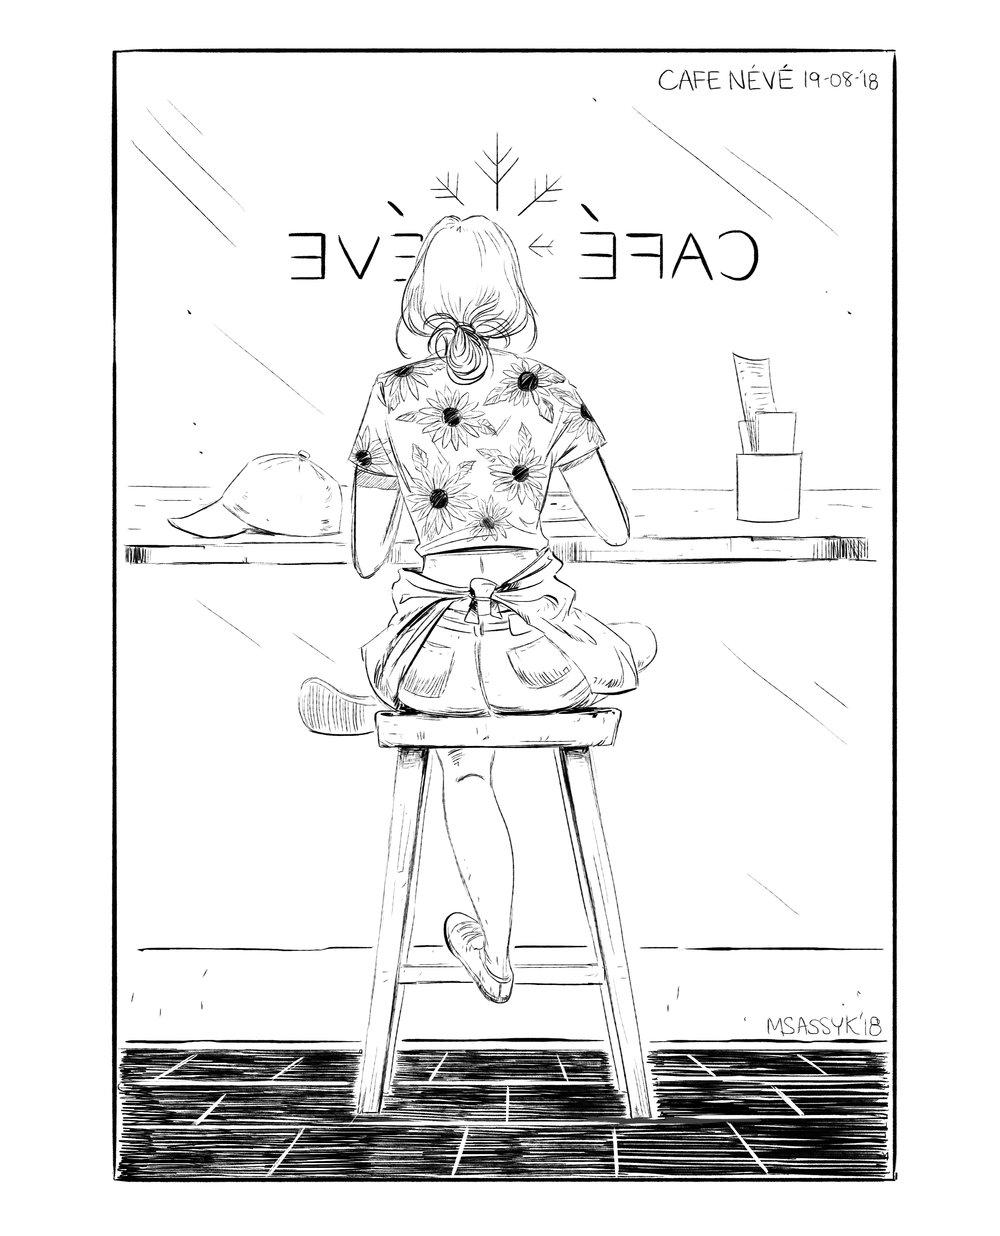 CafeNeve.jpg